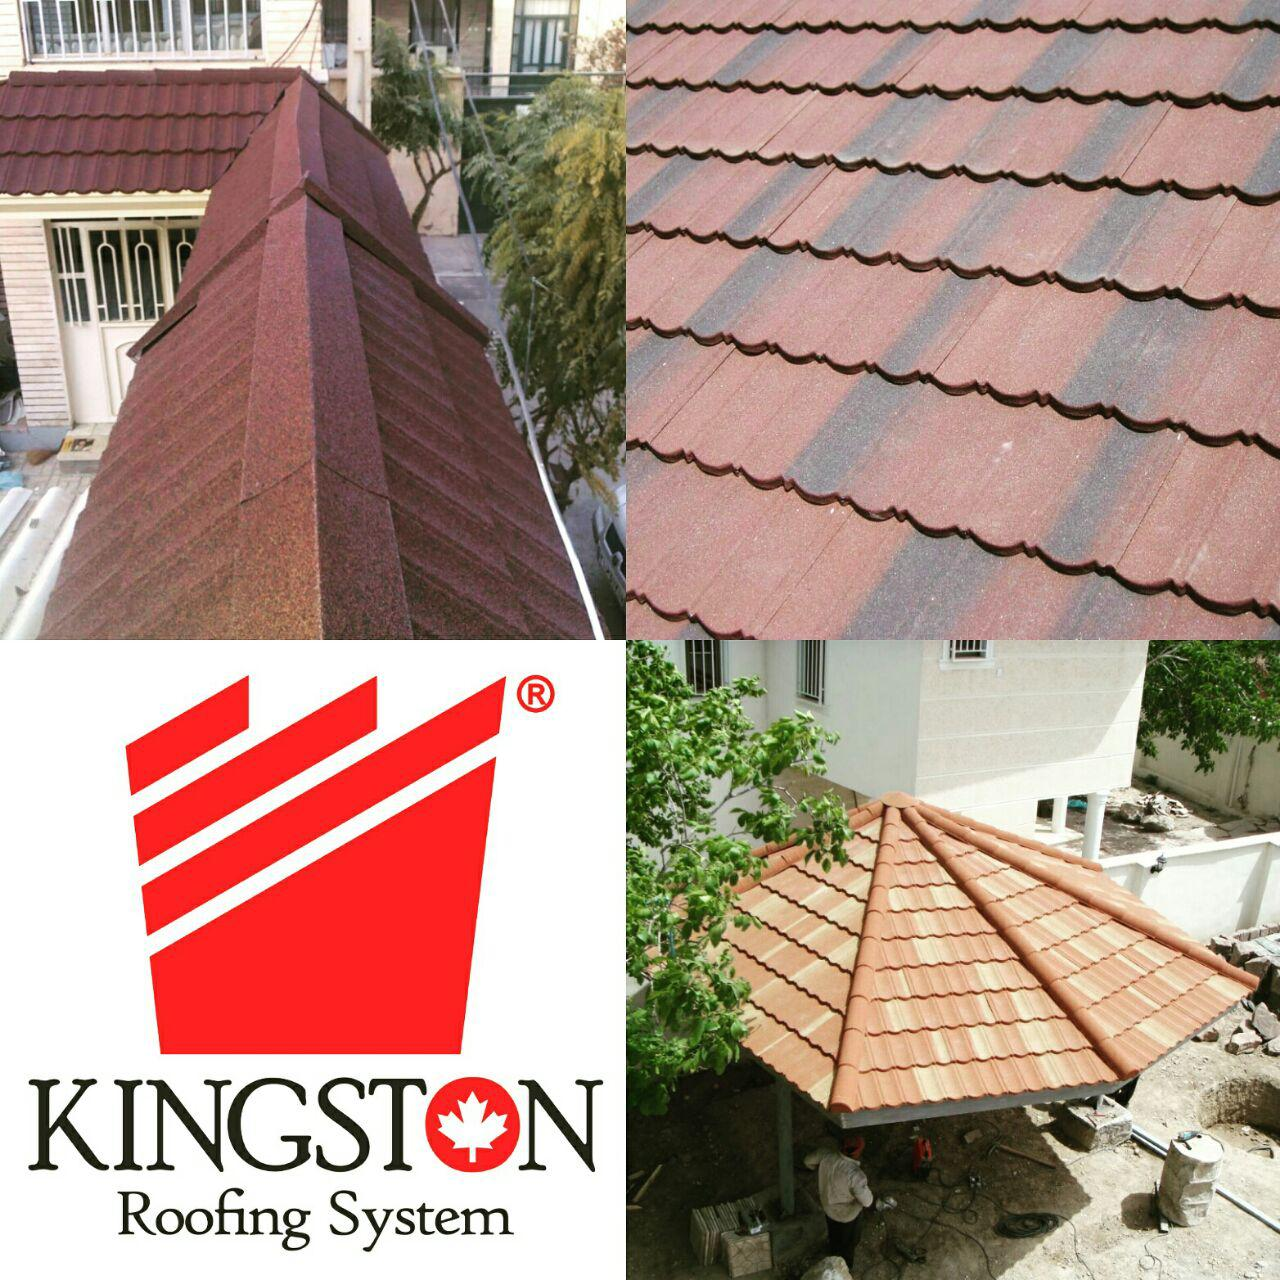 طرح سنگریزه ای، پیشانی آپارتمان، پوشش سقف شیبدار،